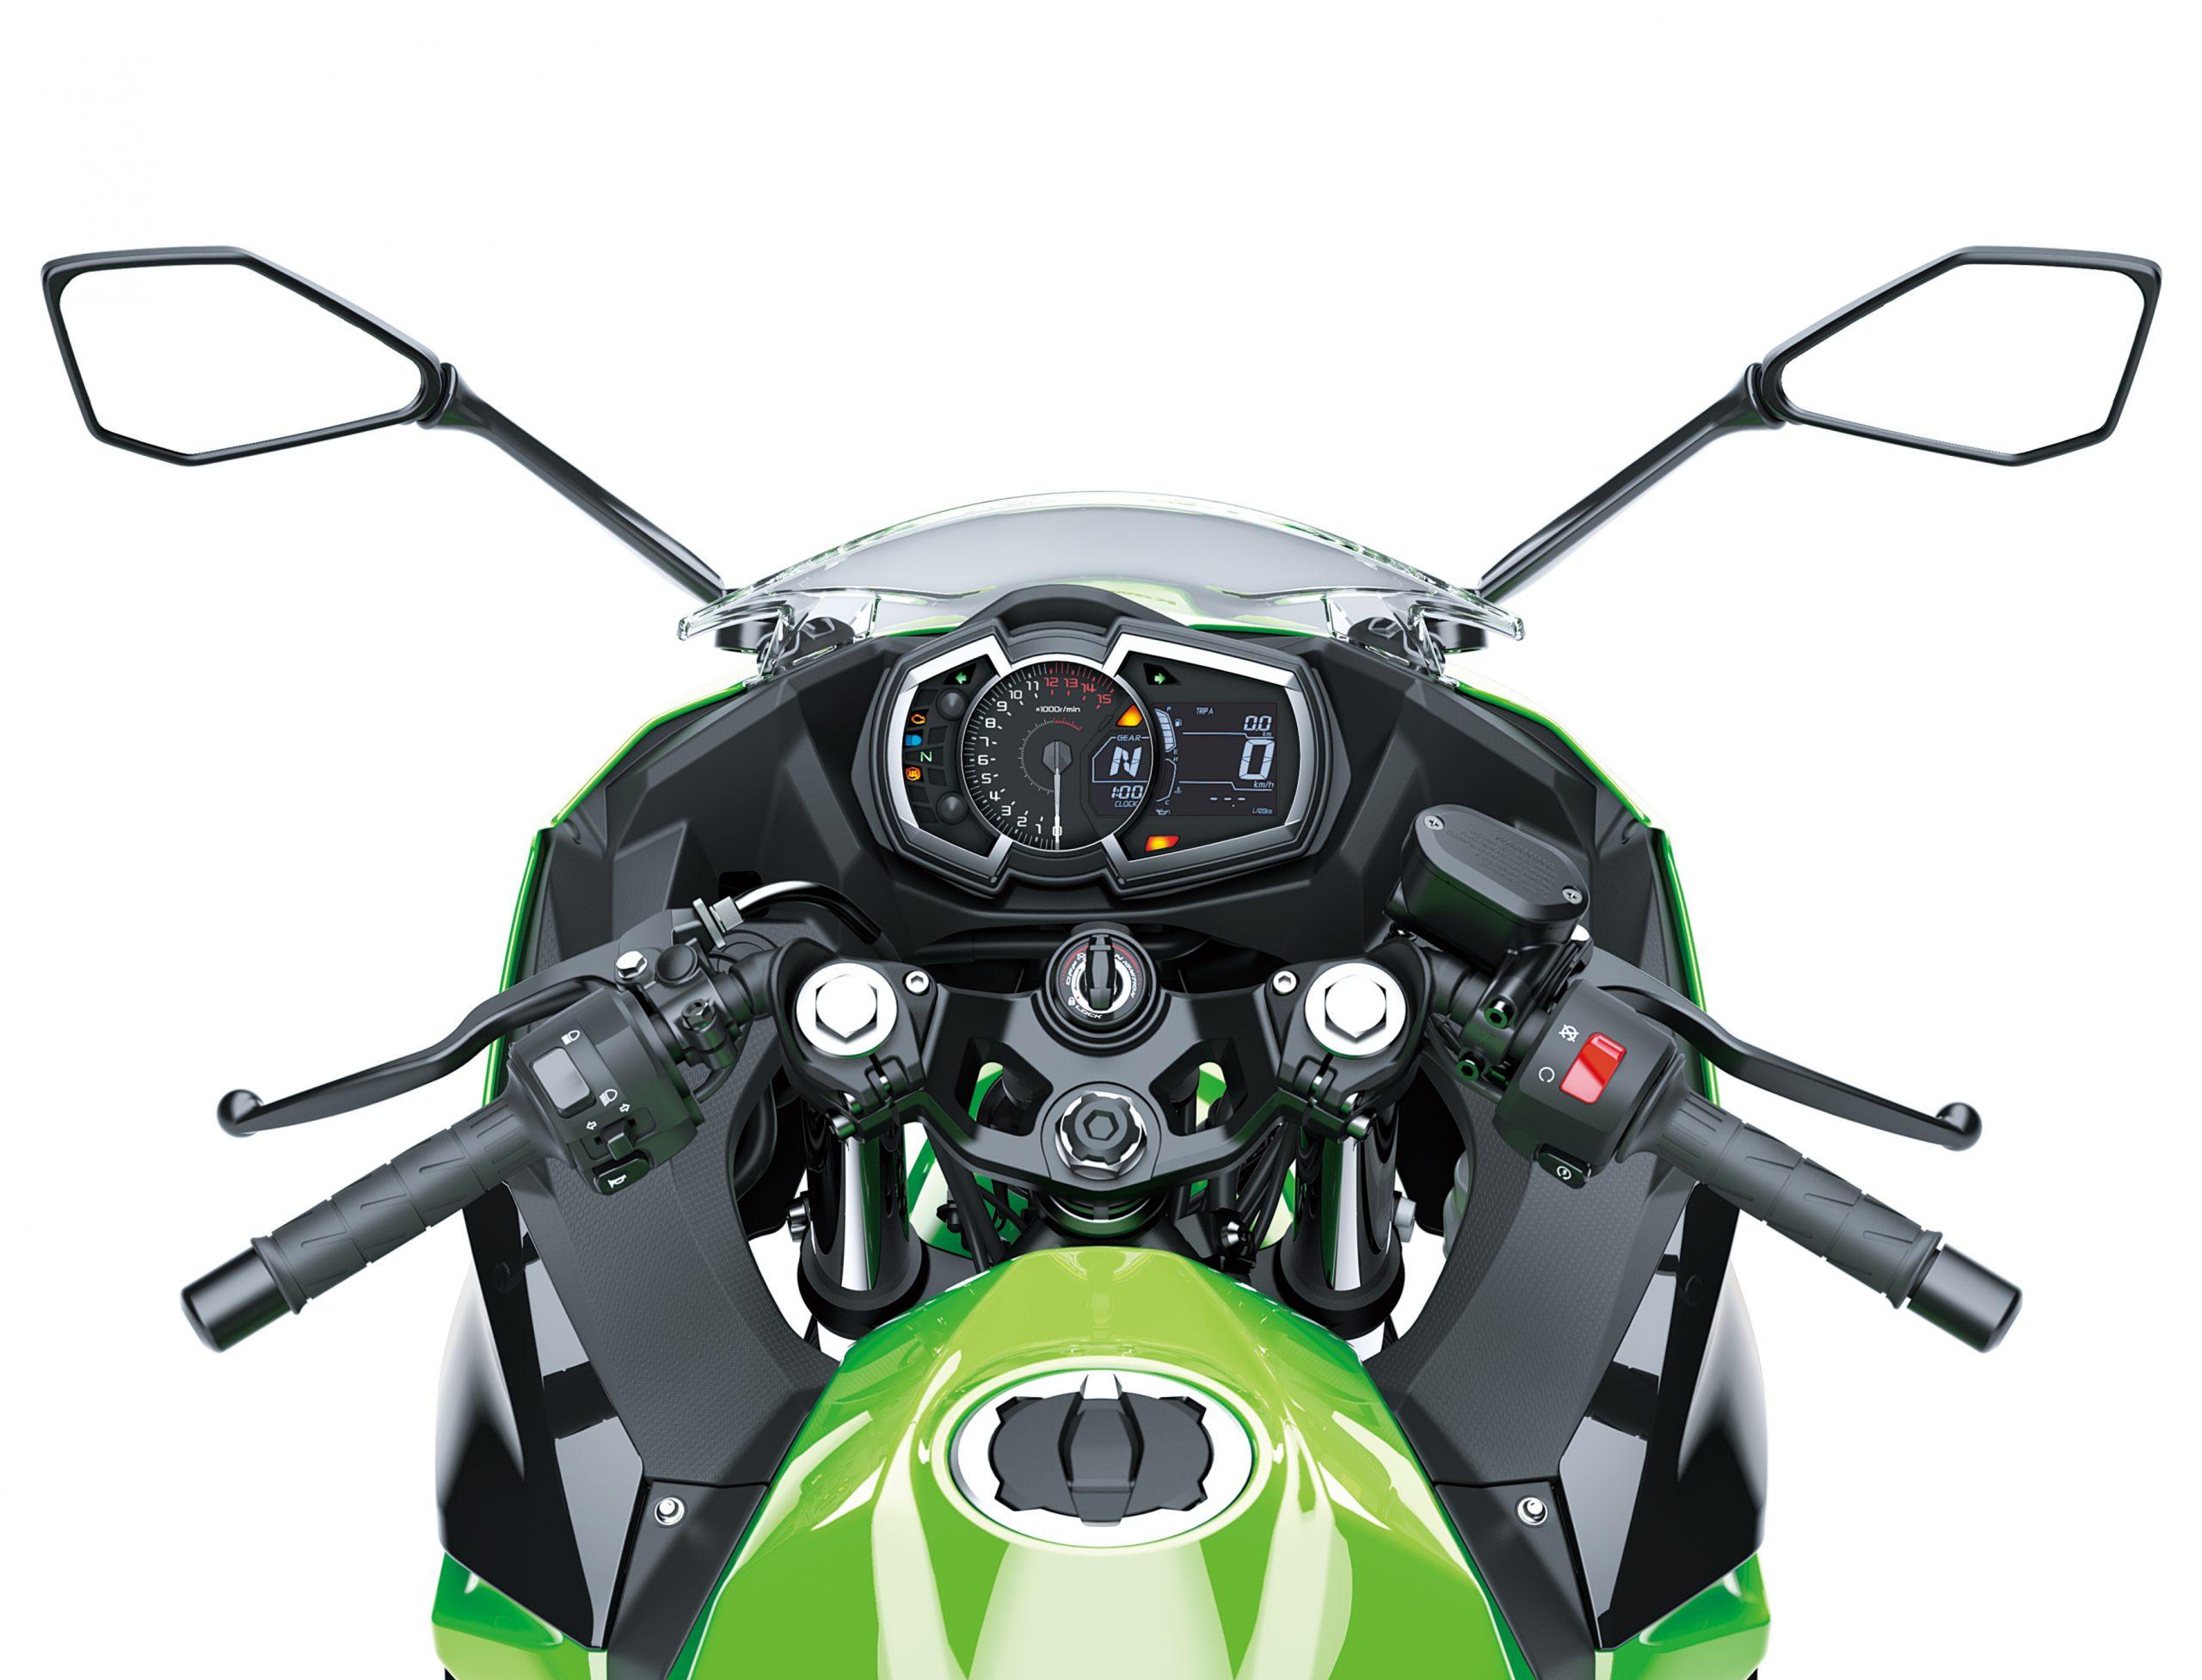 Ninja 400 – Details (5)